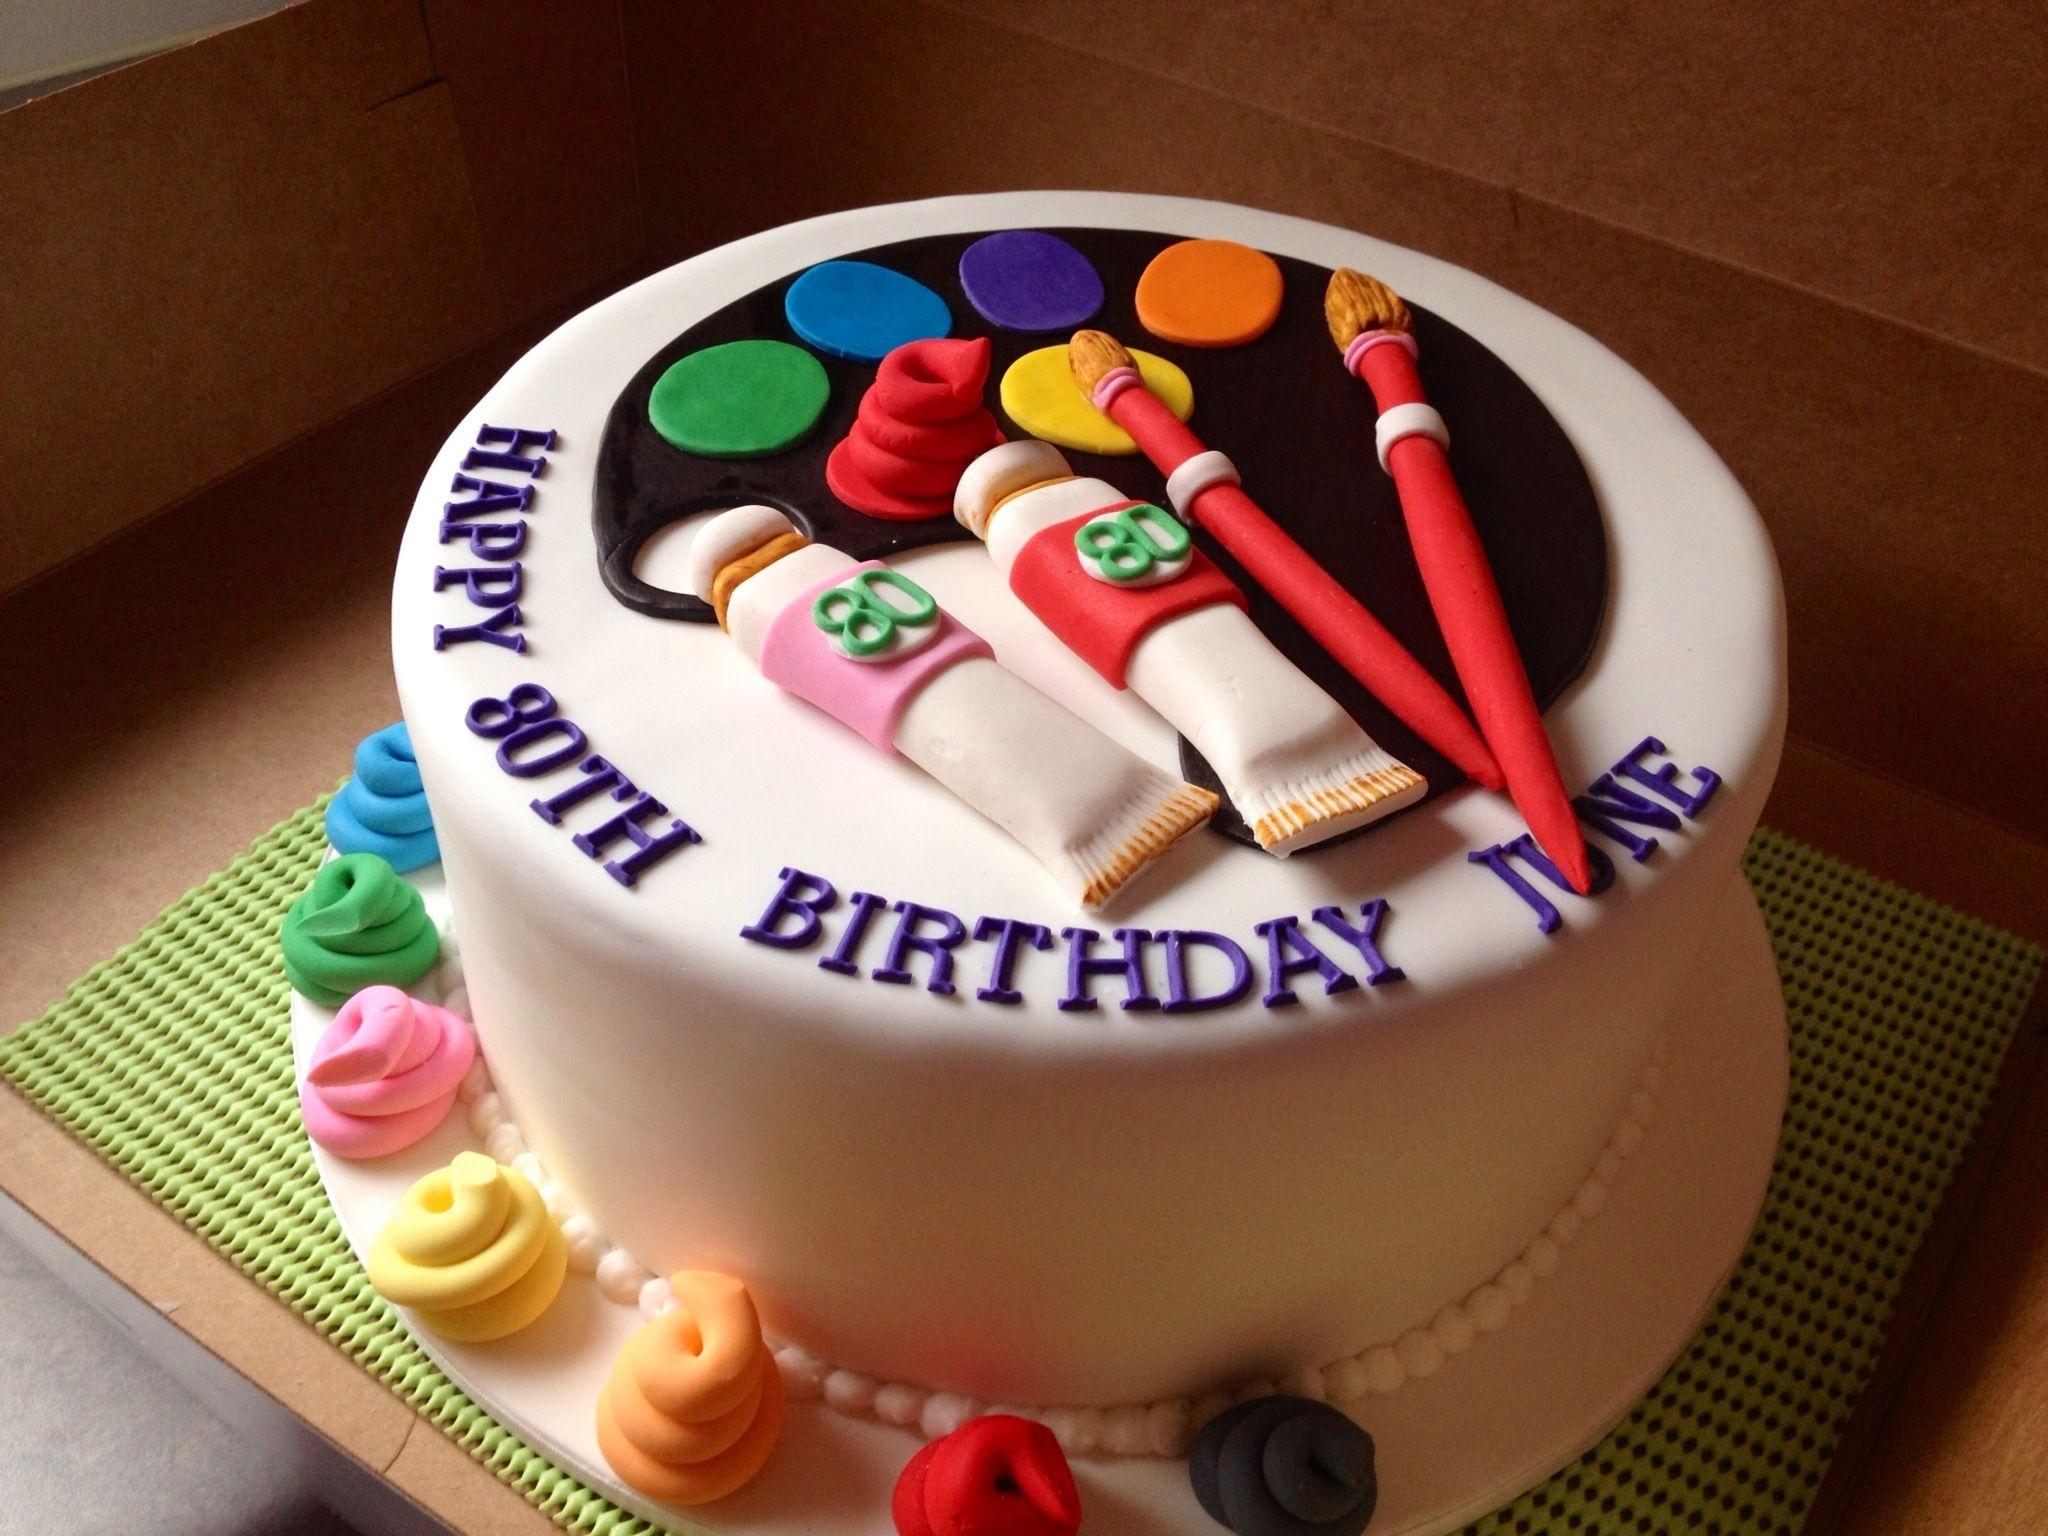 Artists paint pallet cake. D'lish Cupcakes & Accessories